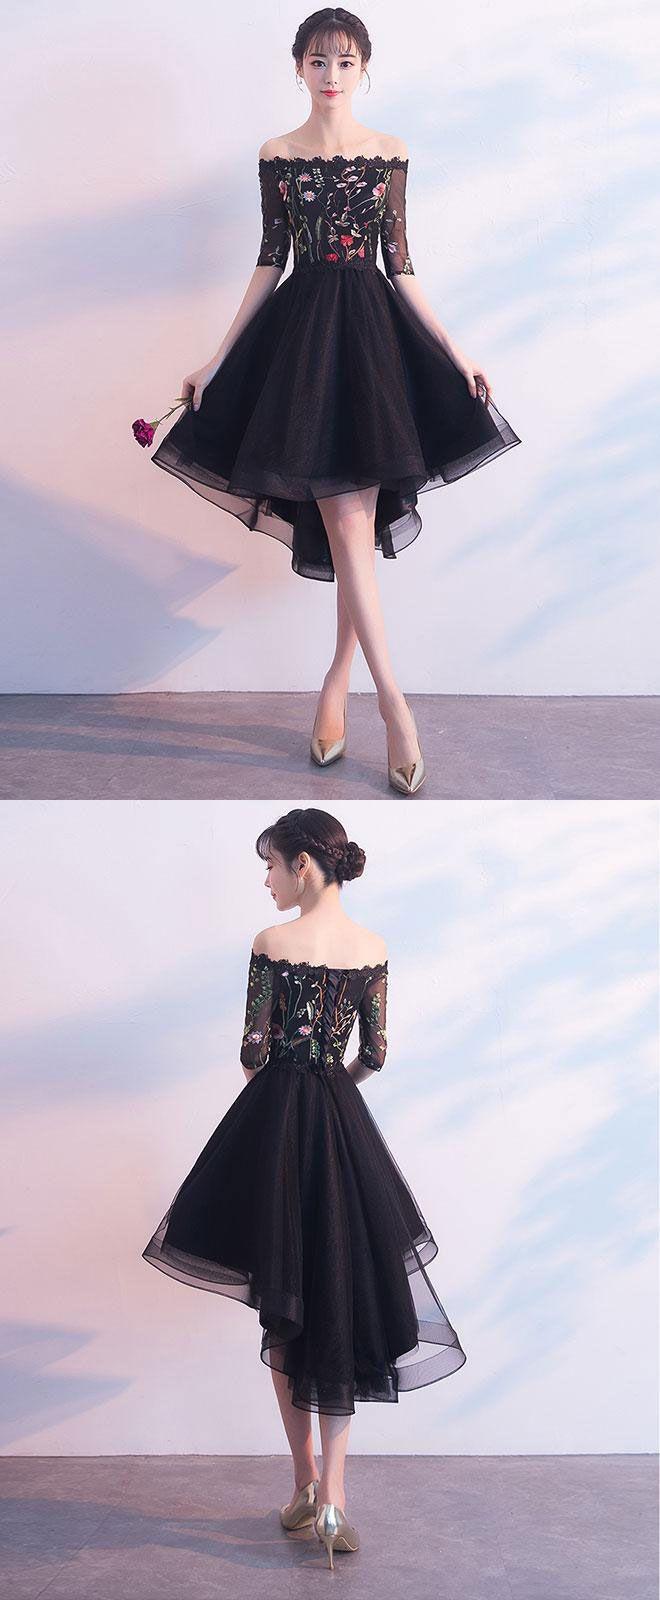 Black tulle lace short prom dress black evening dress want